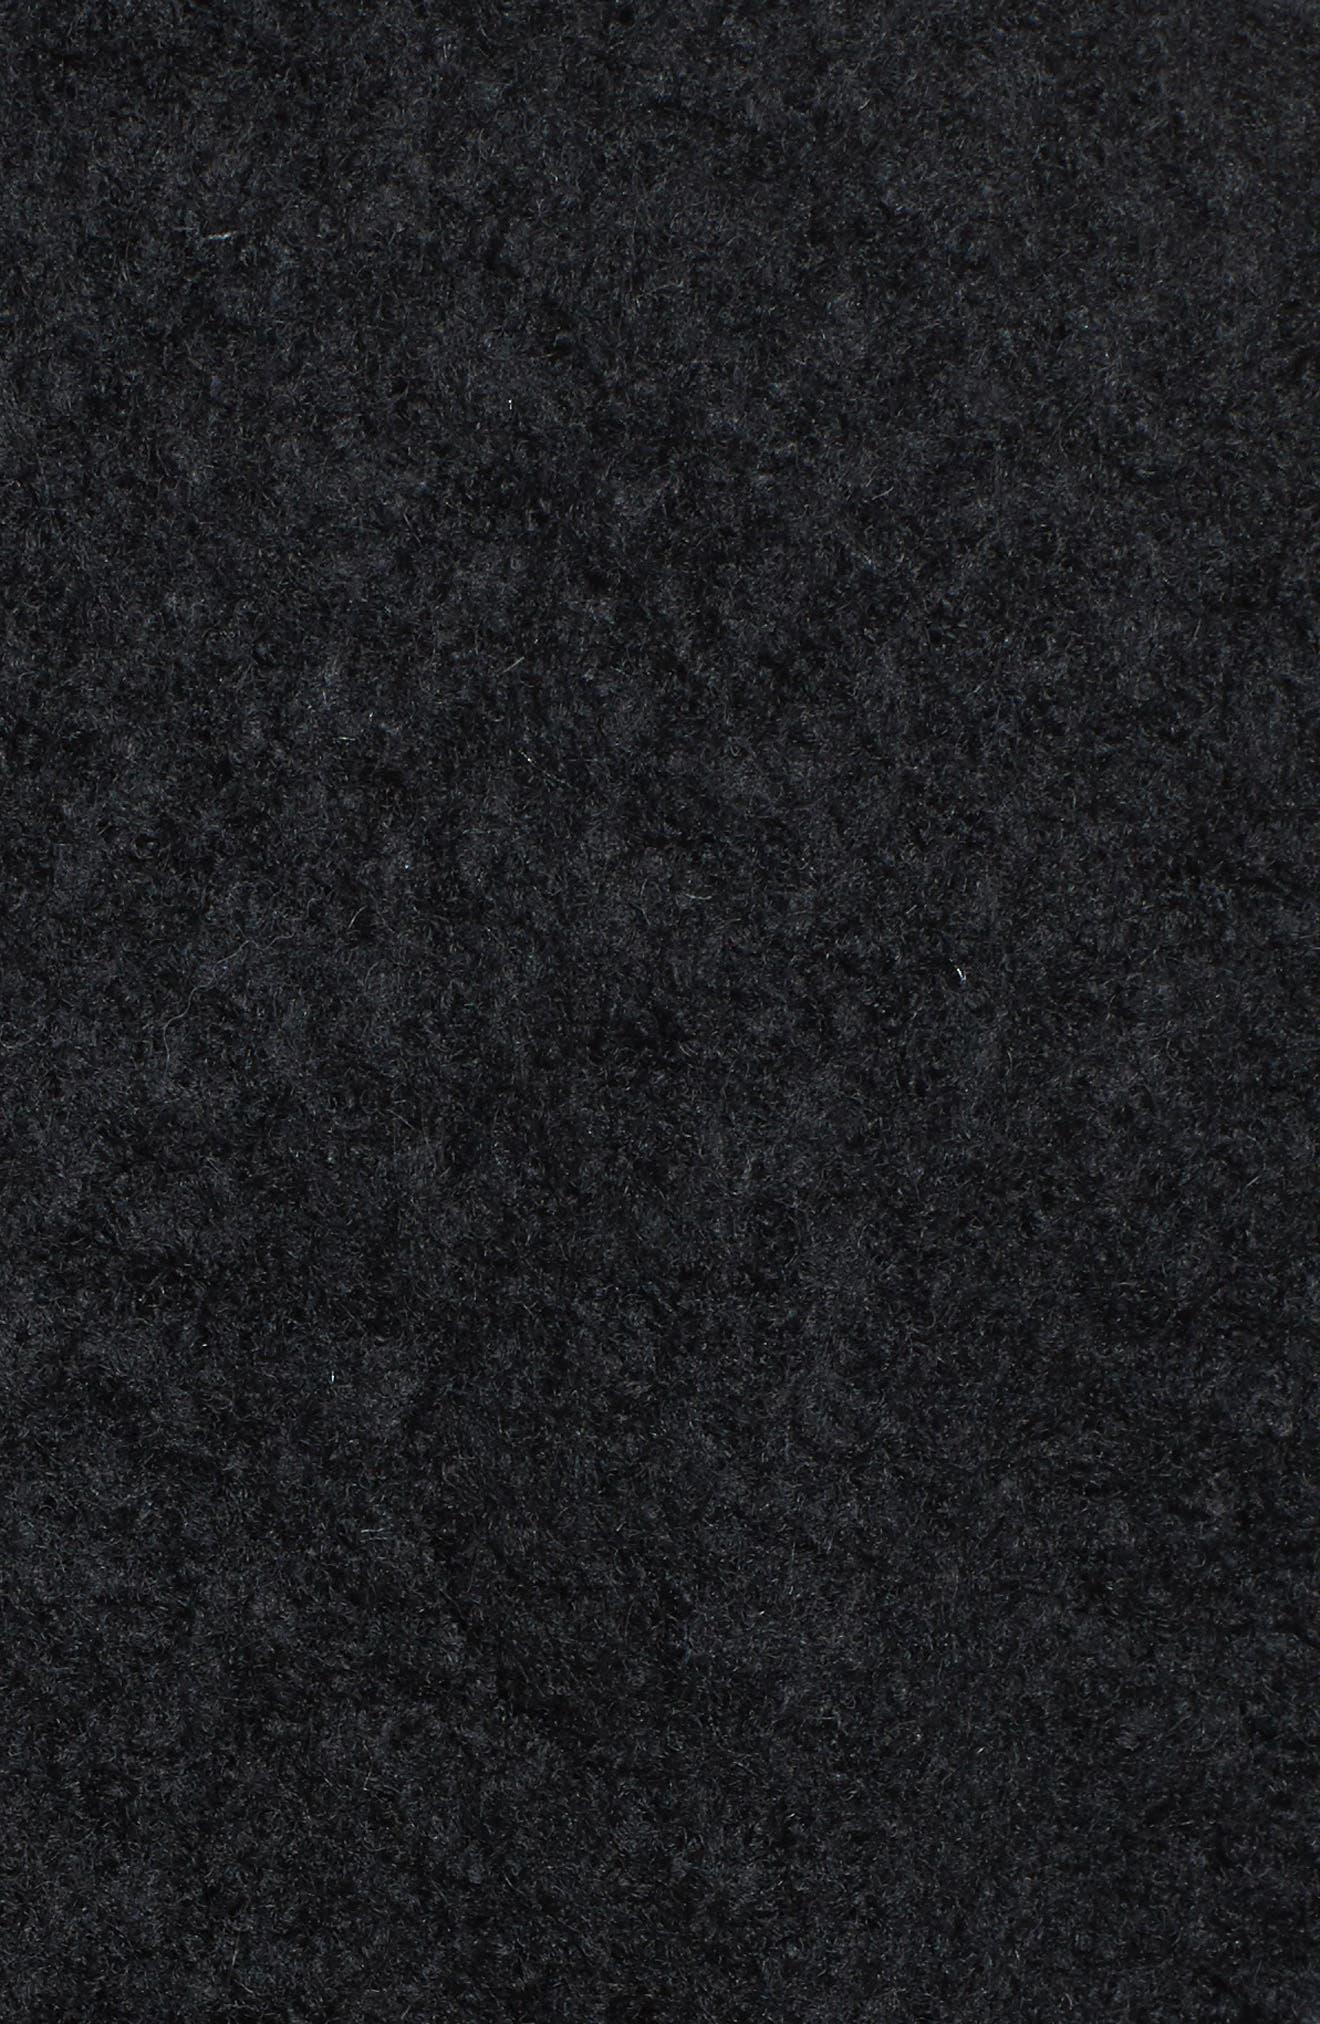 'Tessa' Boiled Wool Blend Coat,                             Alternate thumbnail 6, color,                             001